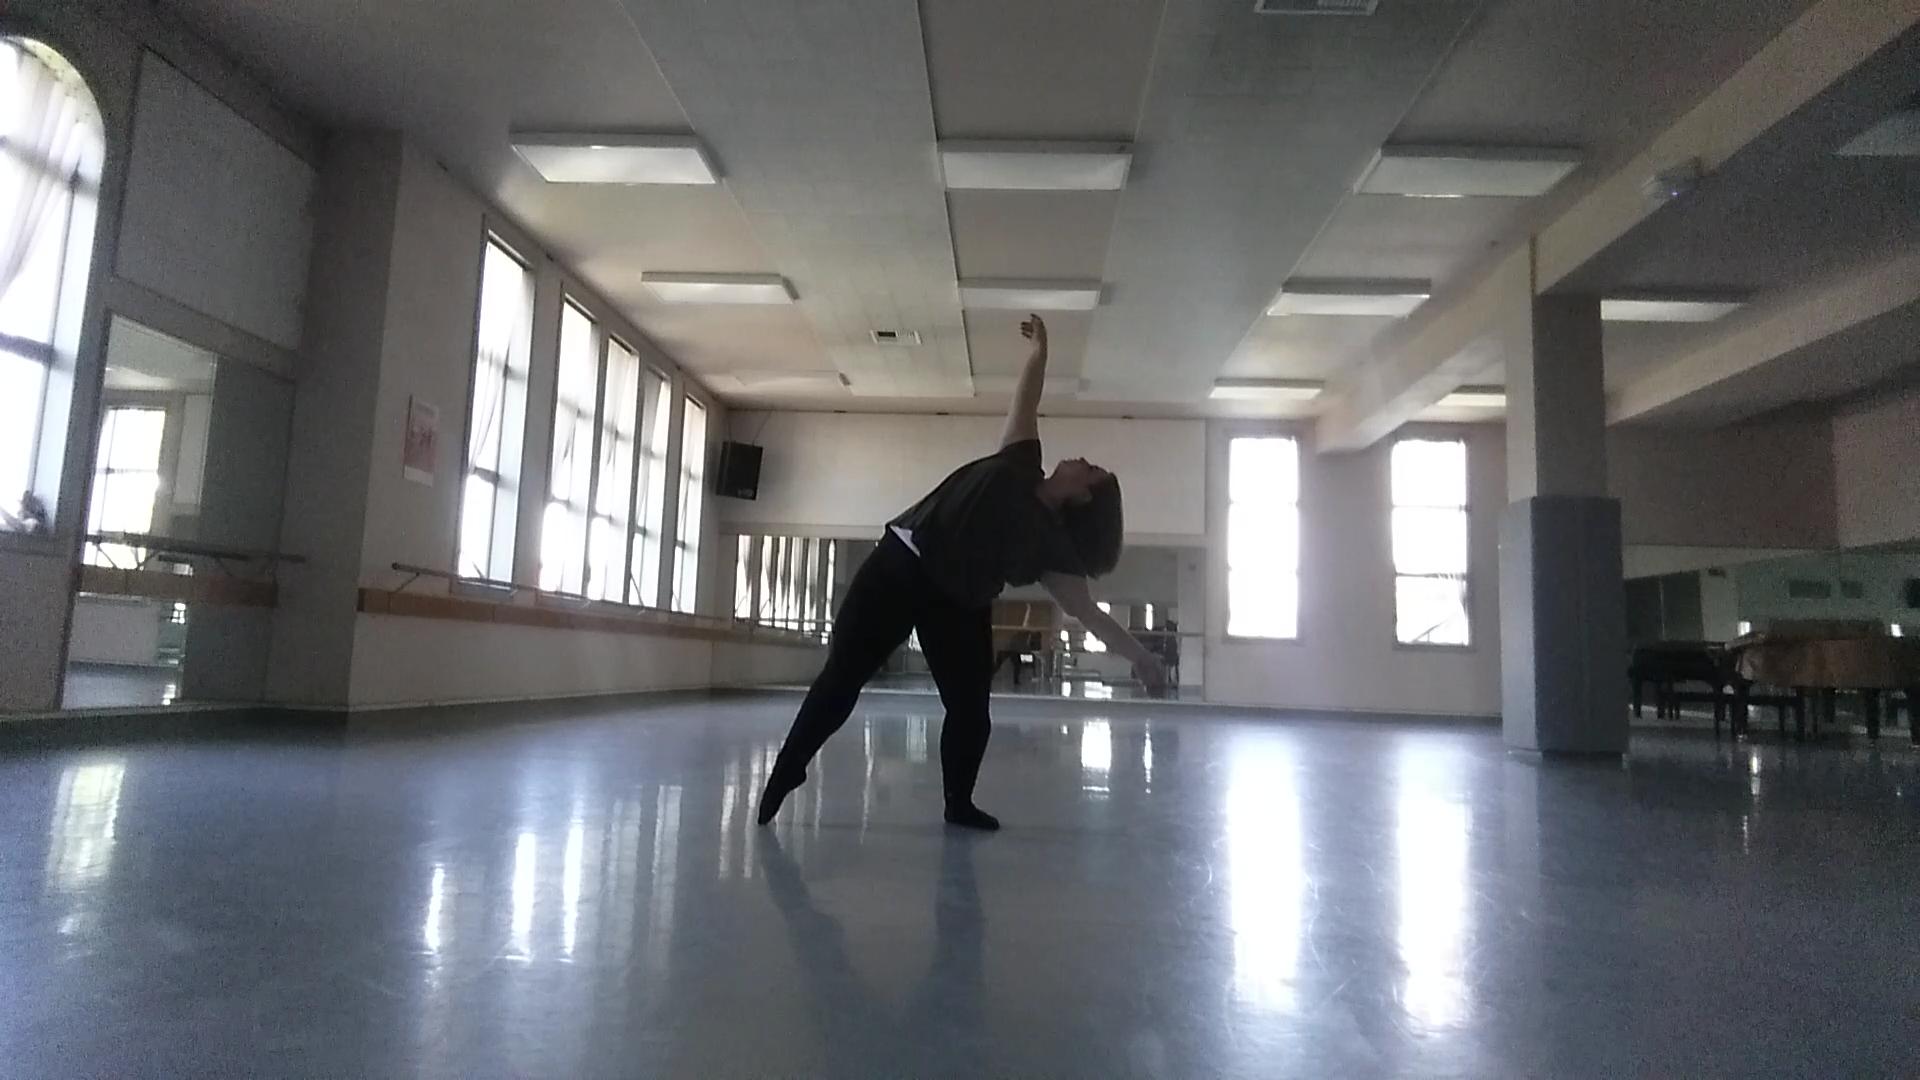 The 10 Best Dance Classes Near Me 2017